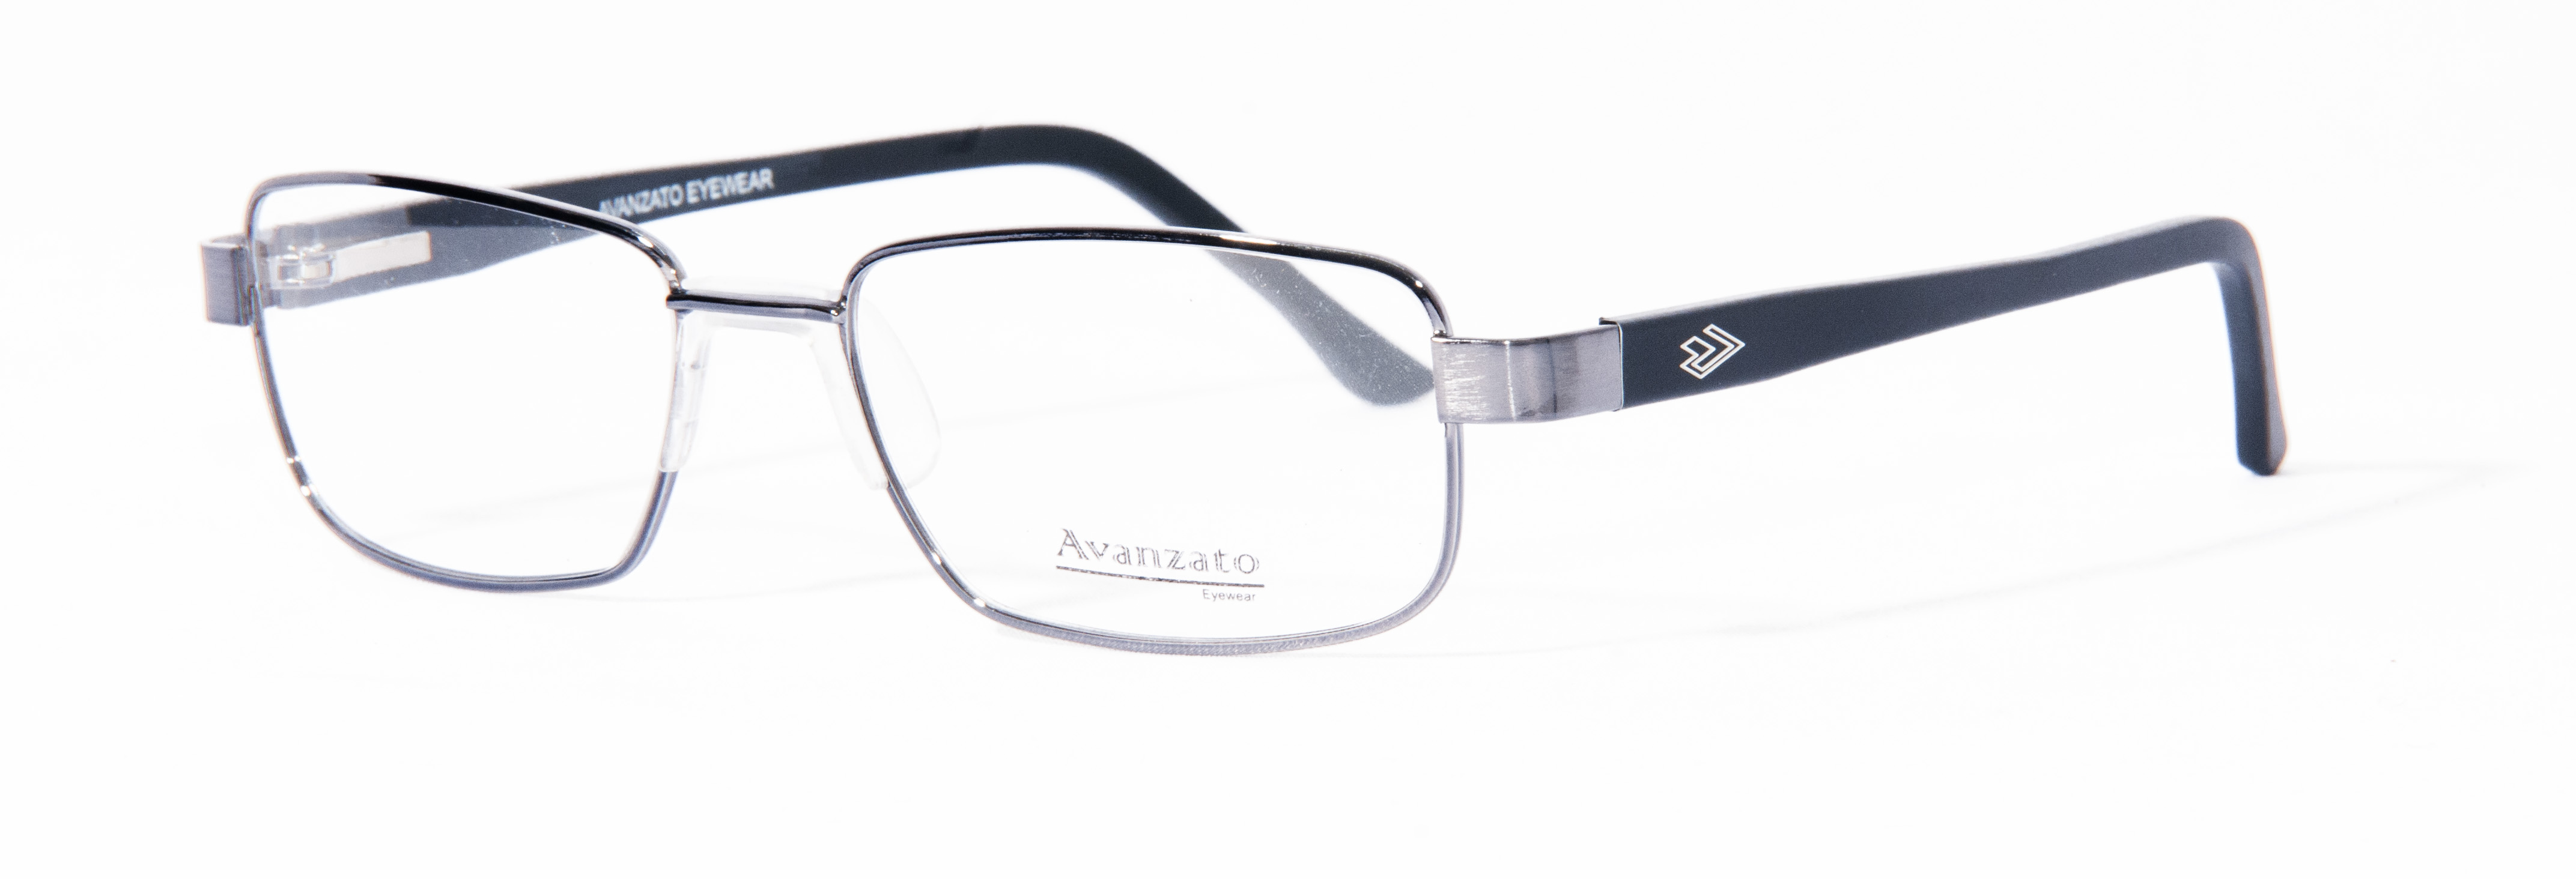 Óculos de Metal - Ponte Anatômica - Avanzato Eyewear 5898 T54 - Código 5898 bb34740e27